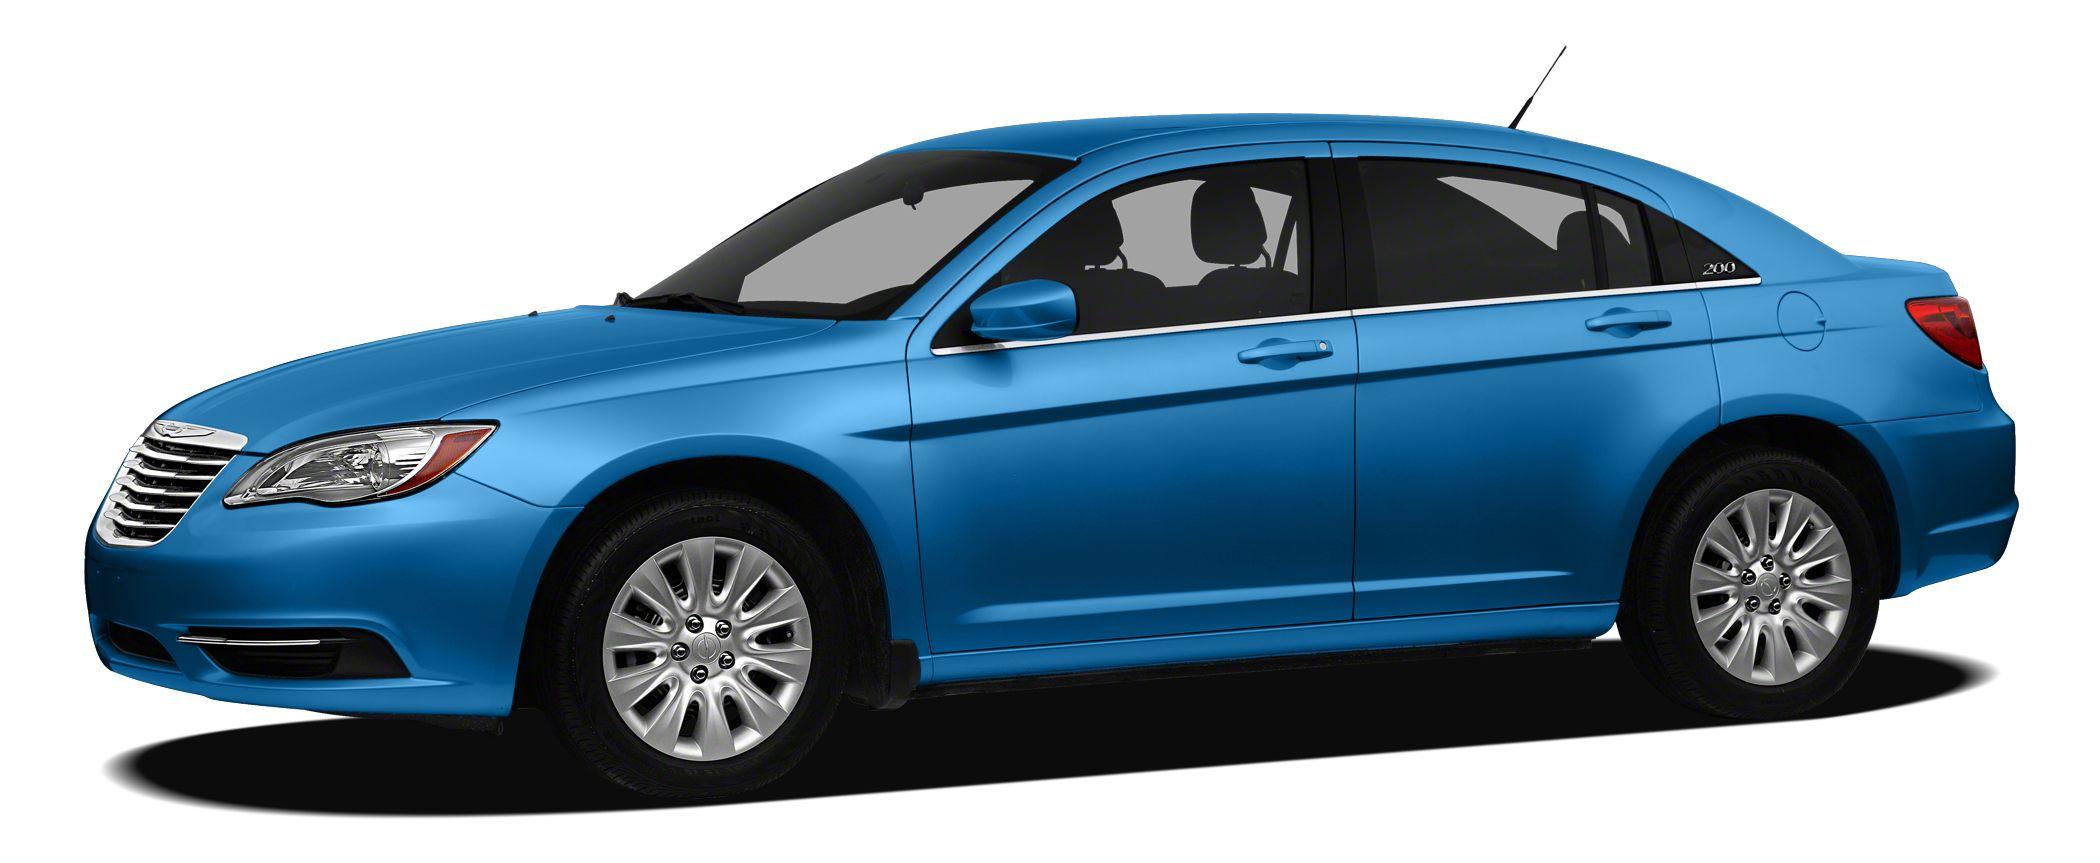 2012 Chrysler 200 Touring 36L V6 Flex Fuel 24V VVT Automatic FWD and Cloth Chrysler FEVER Wh